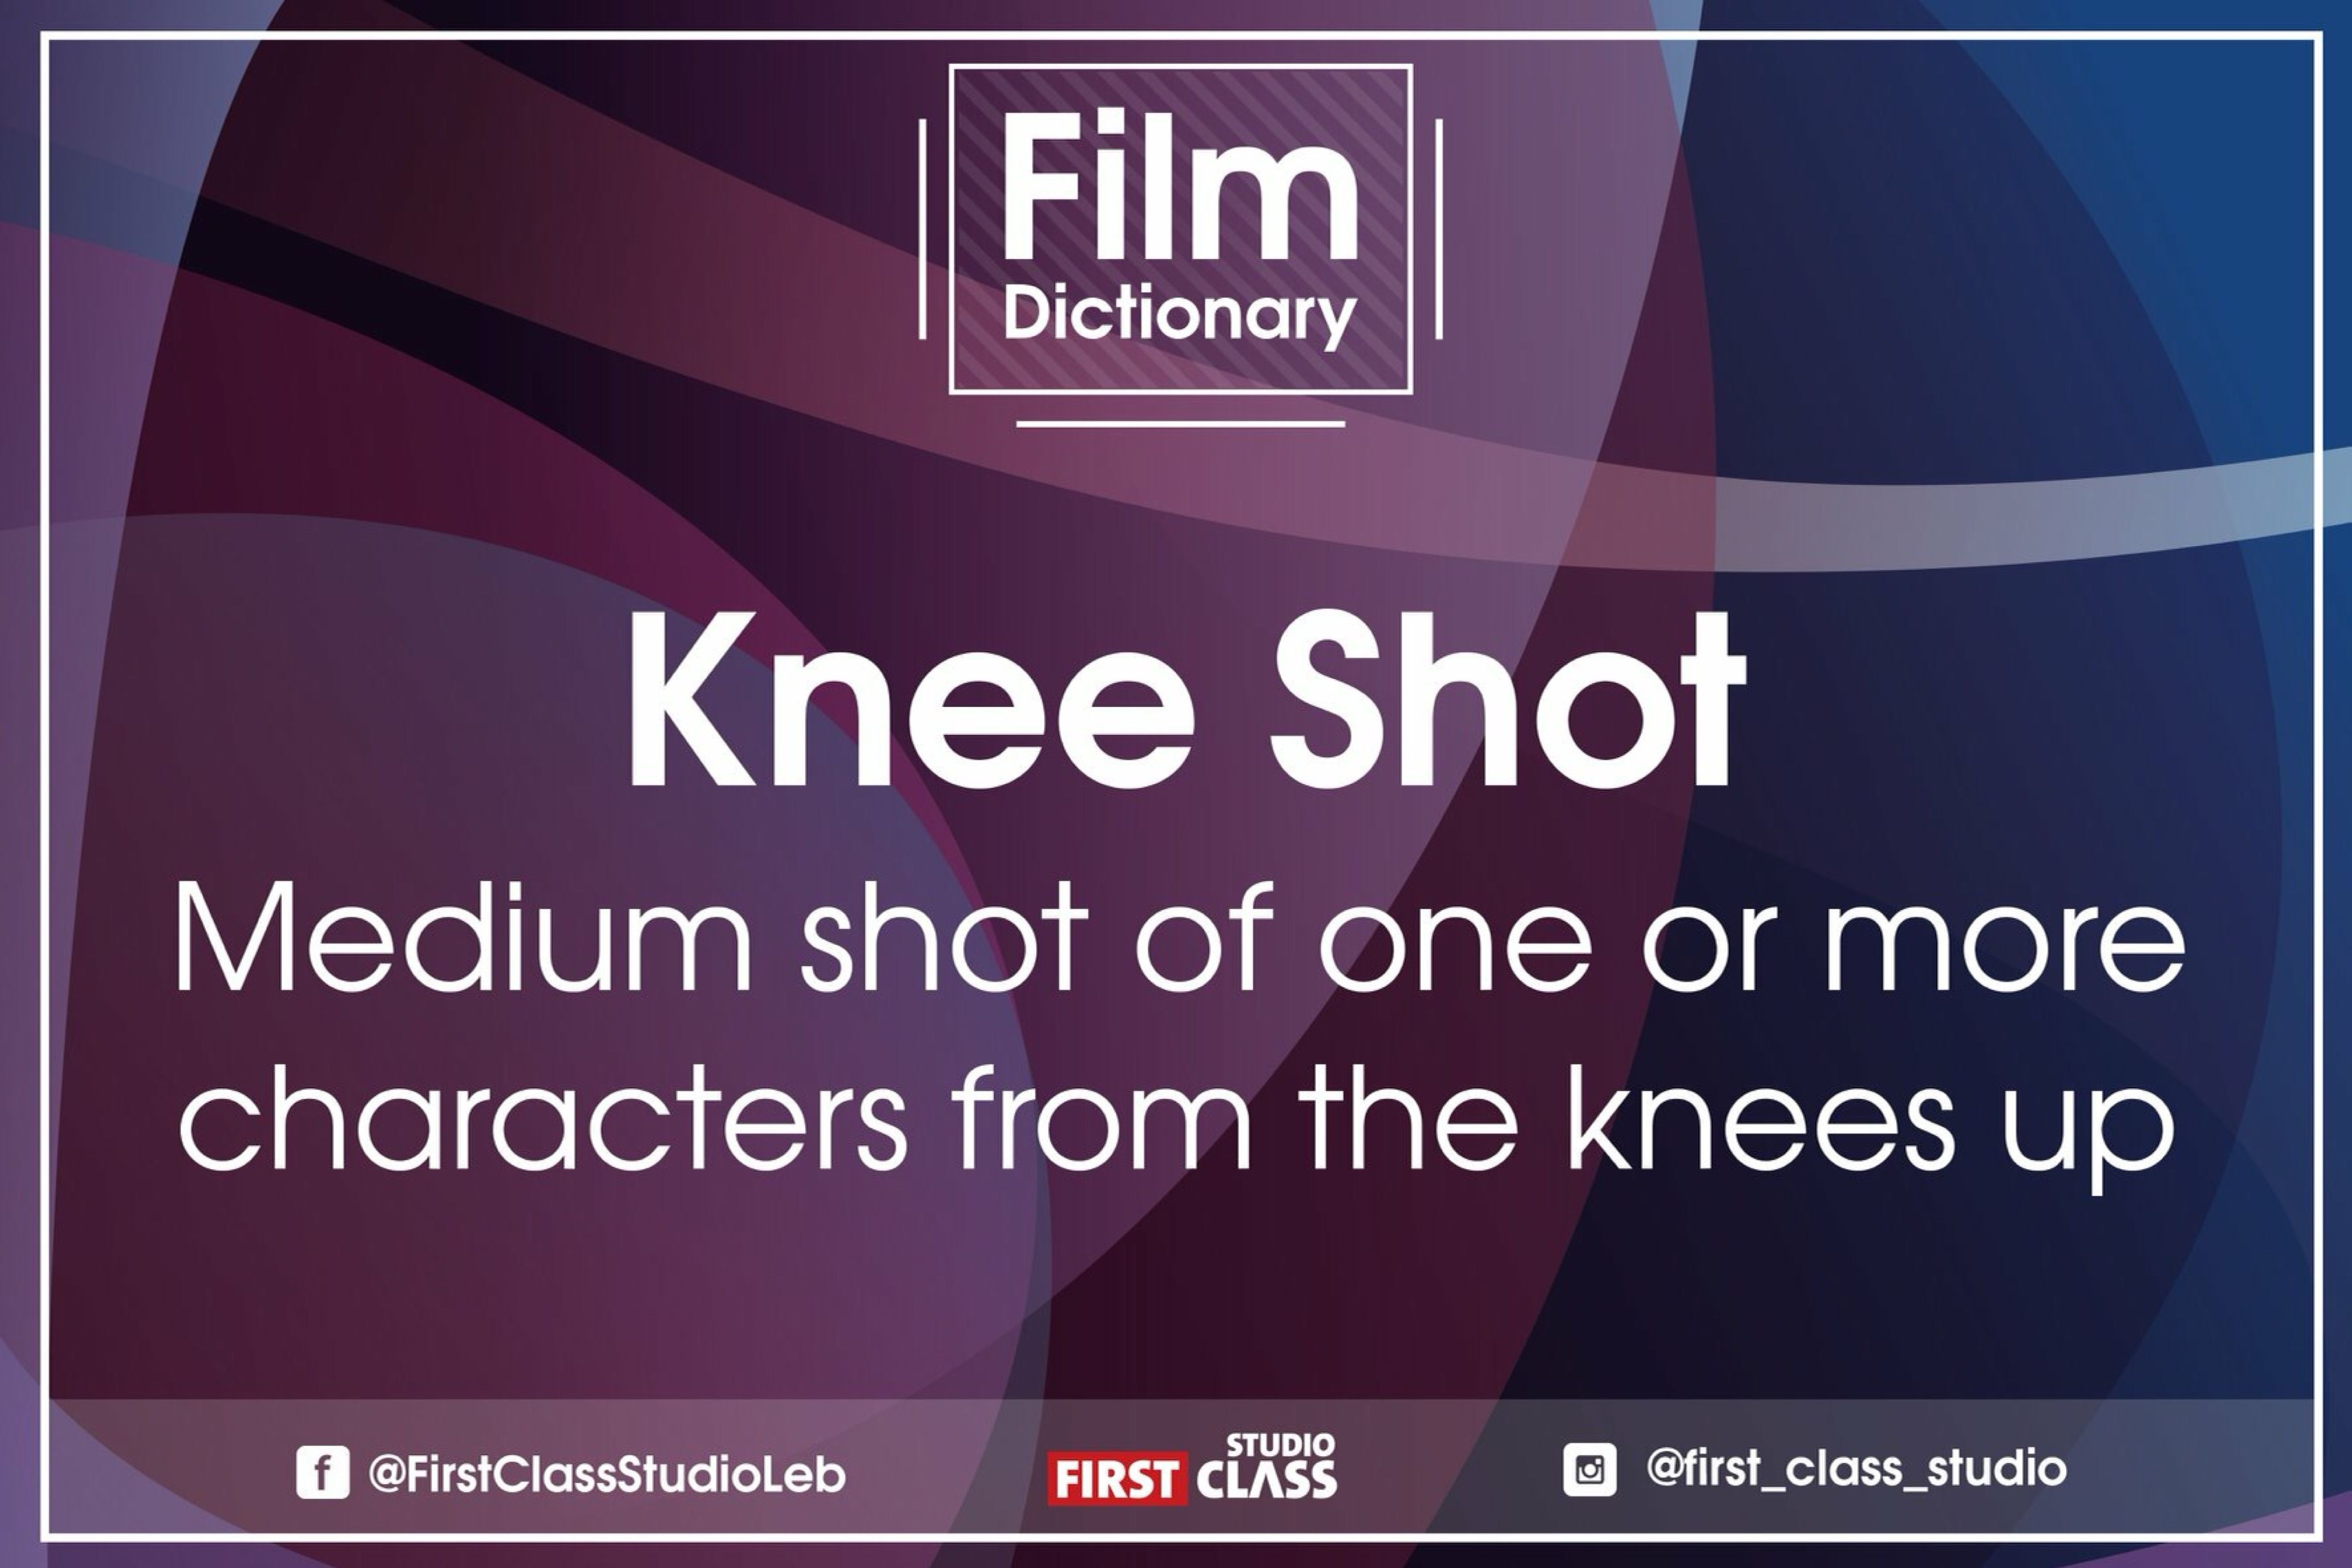 Filmdoctionary fcs film filmmaking kneeshot first